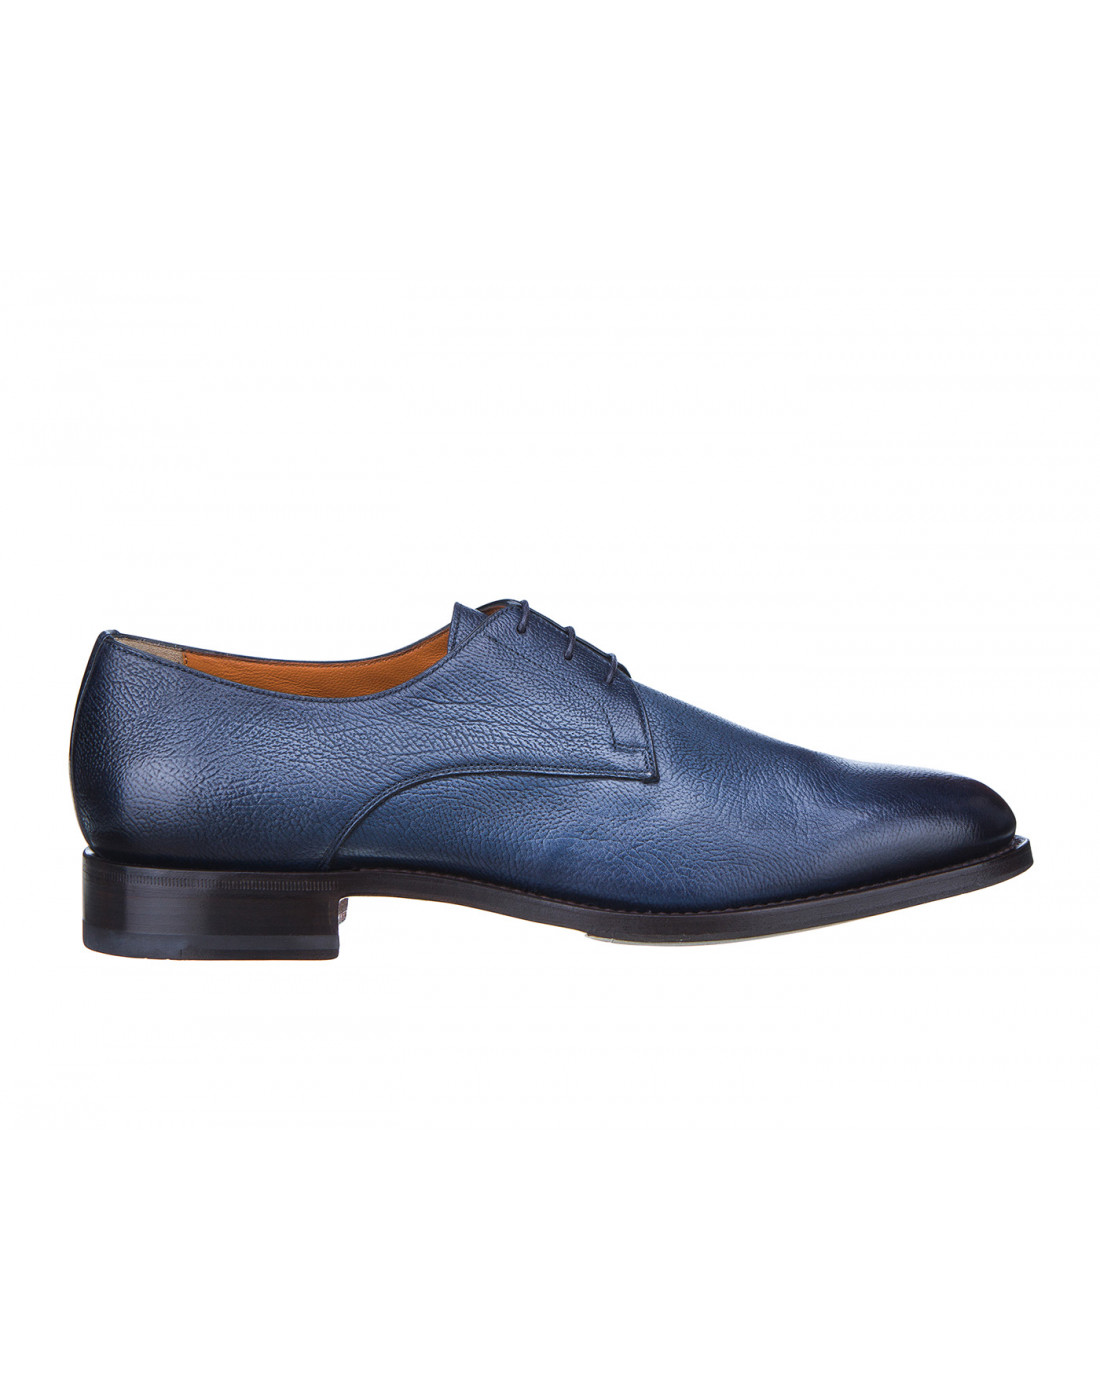 Туфли синие мужские Santoni S14303-1